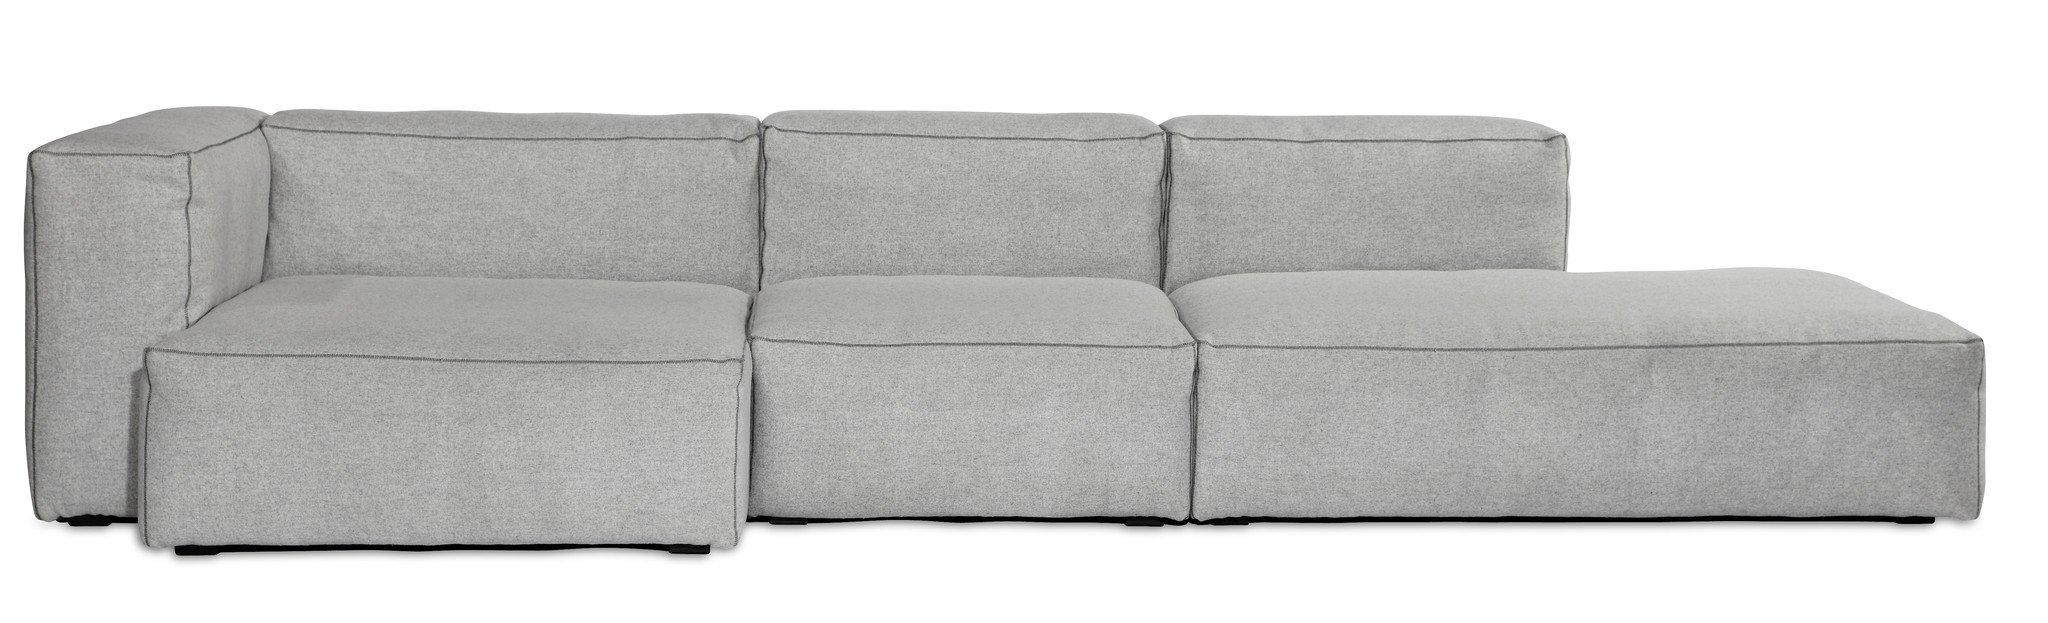 Sofa Modular Dddy Mags soft sofa Modular by Hay Denmark the Modern Shop